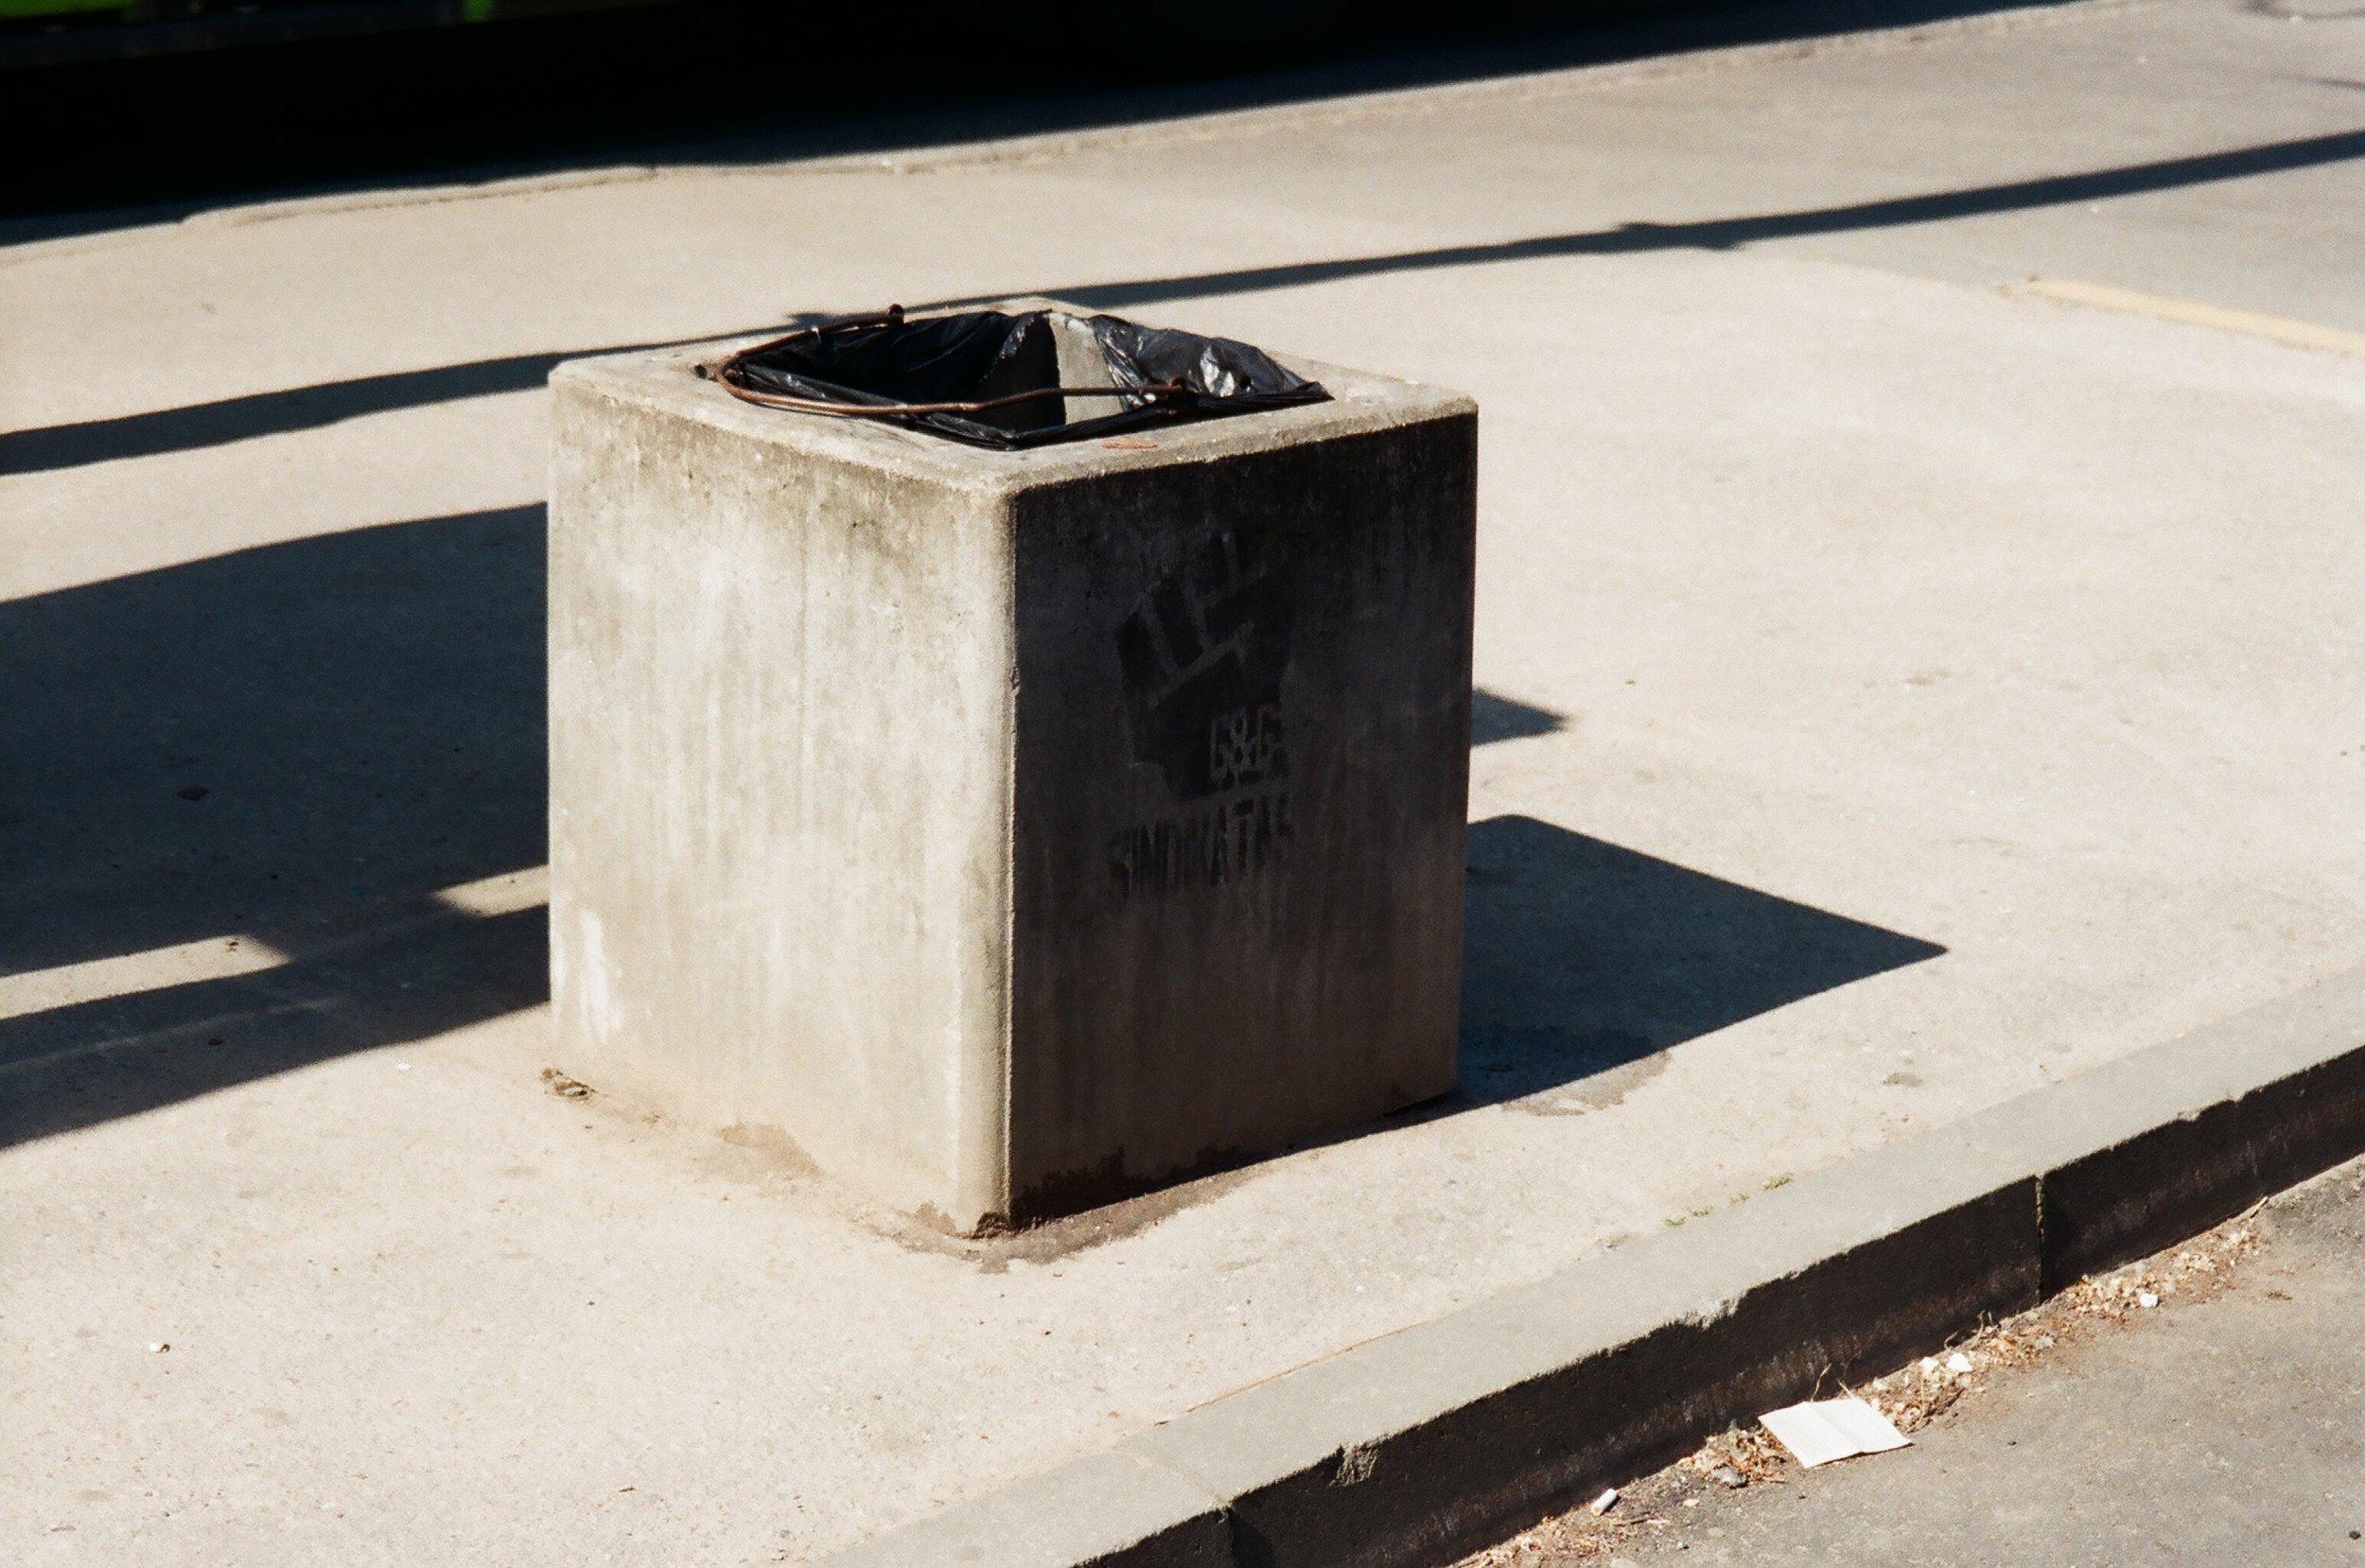 Market aesthetics (trash bin next to the bus stop ).